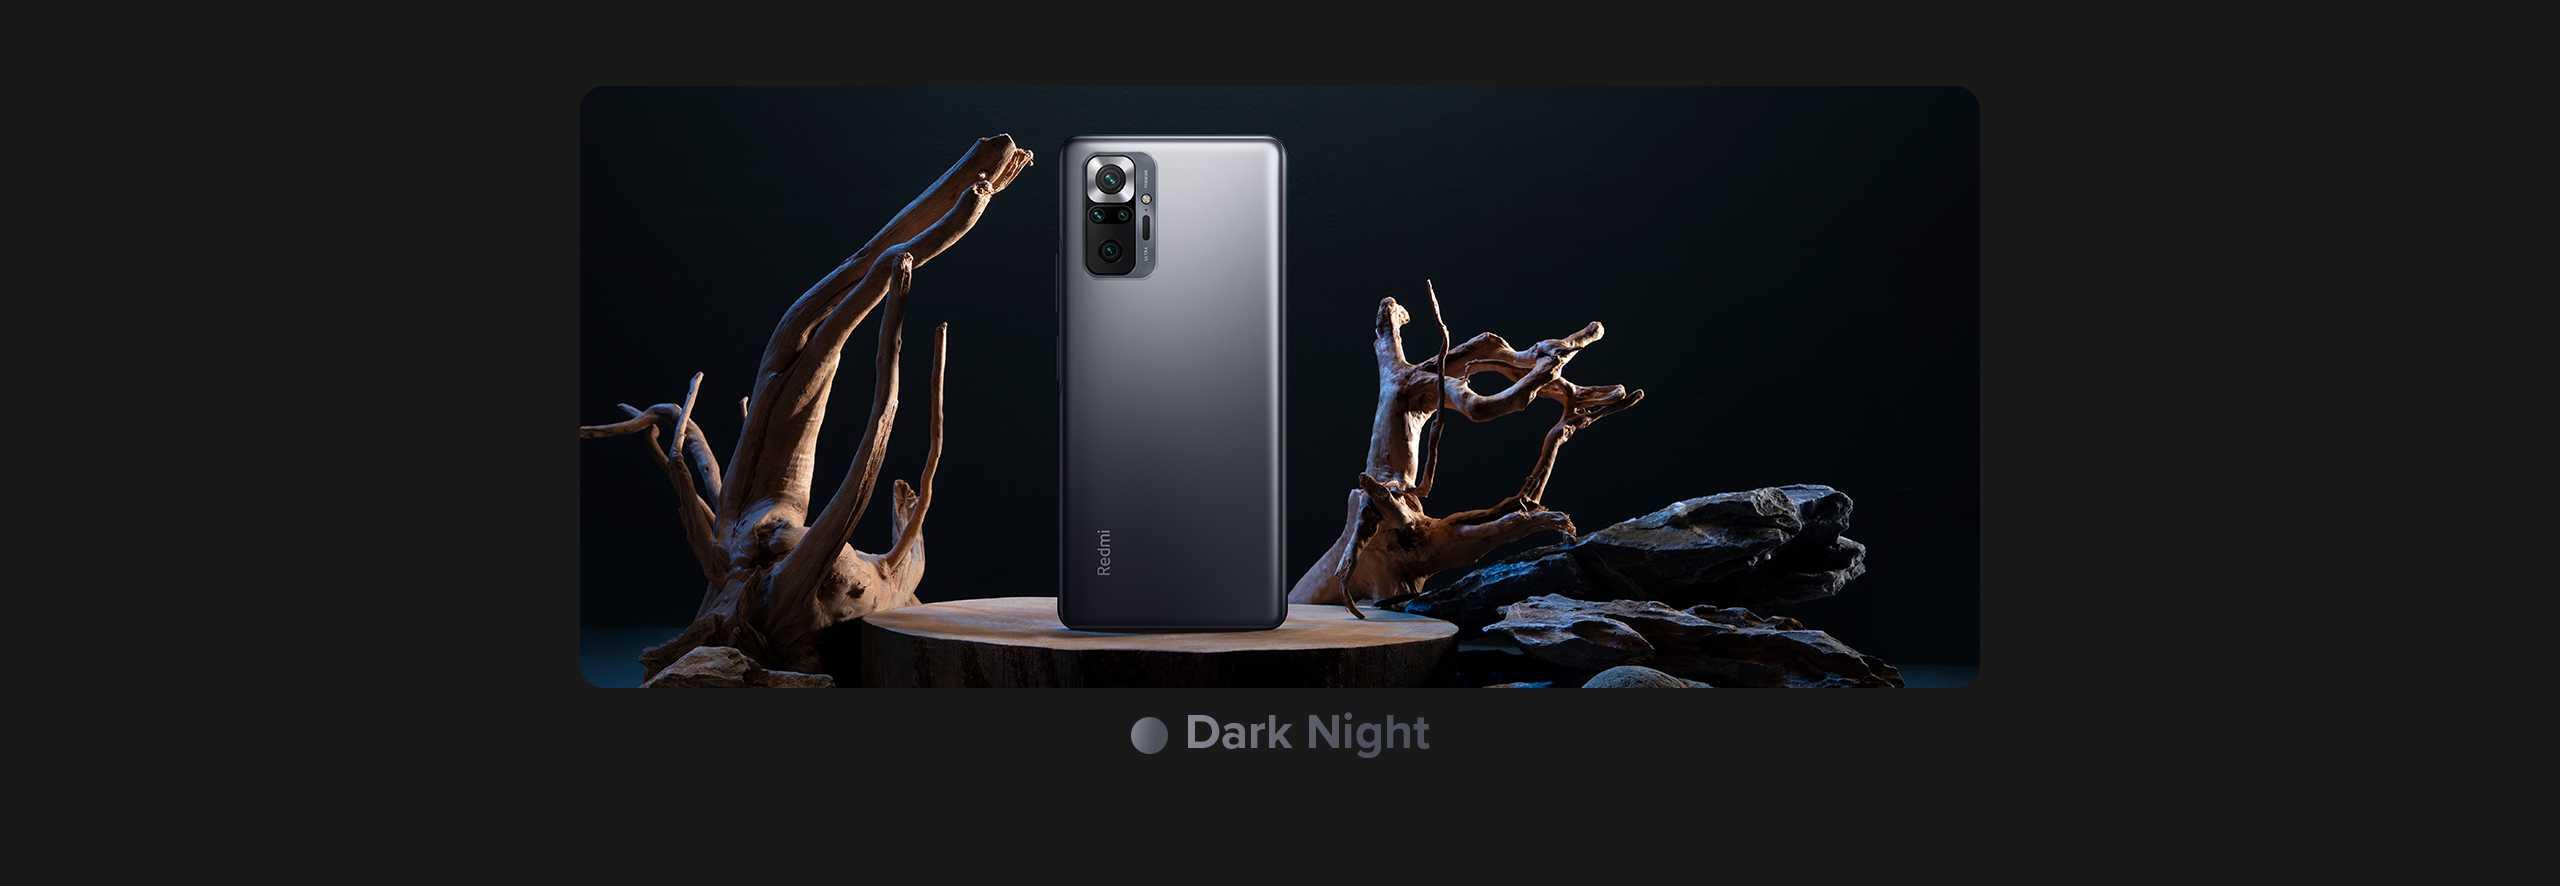 Redmi dark night